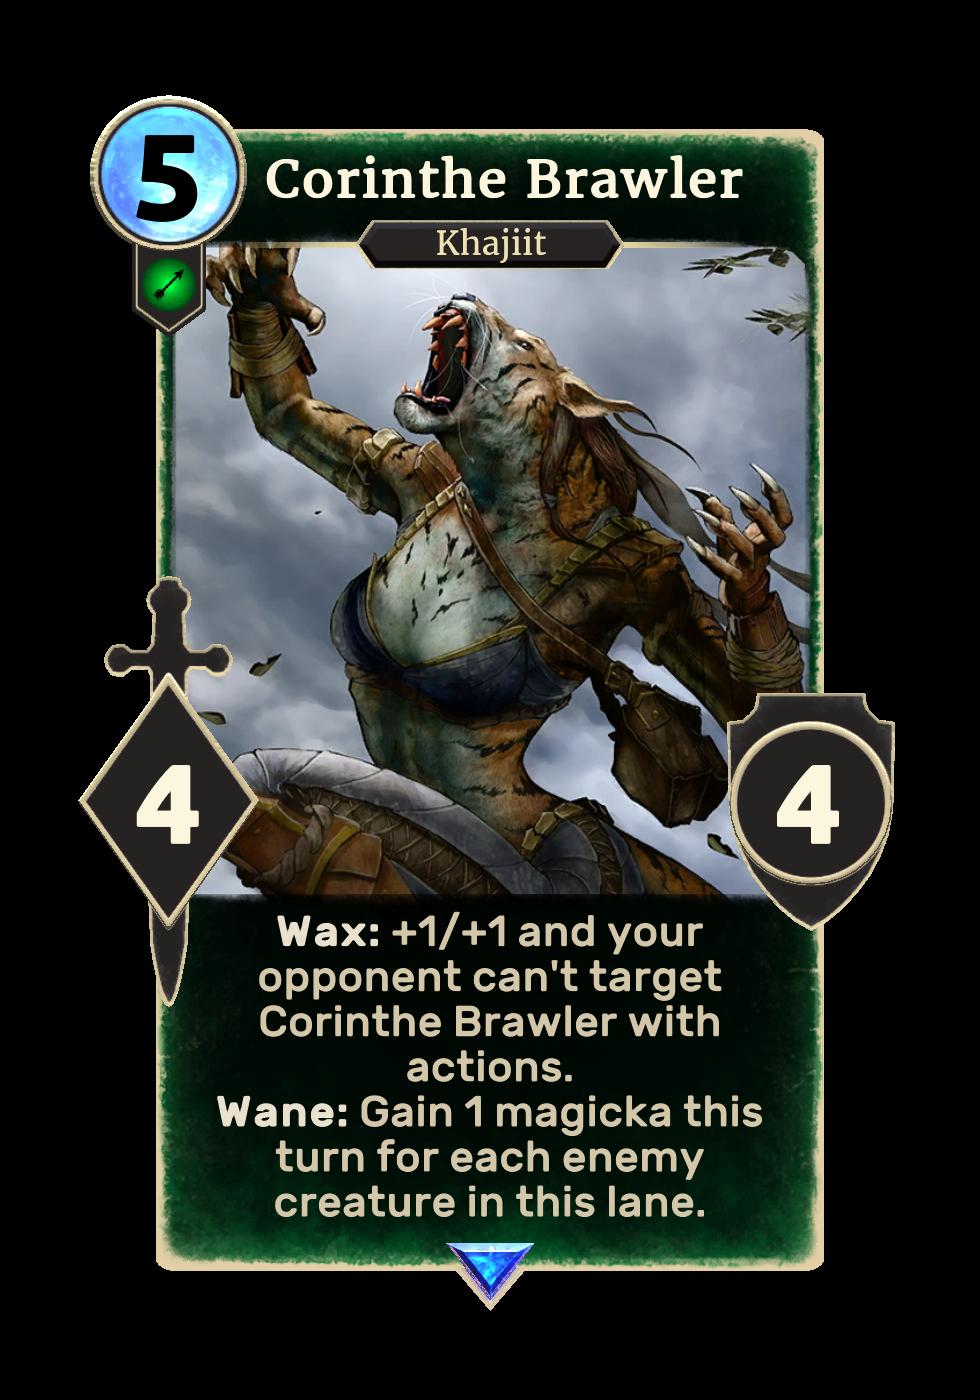 Wax and Wane